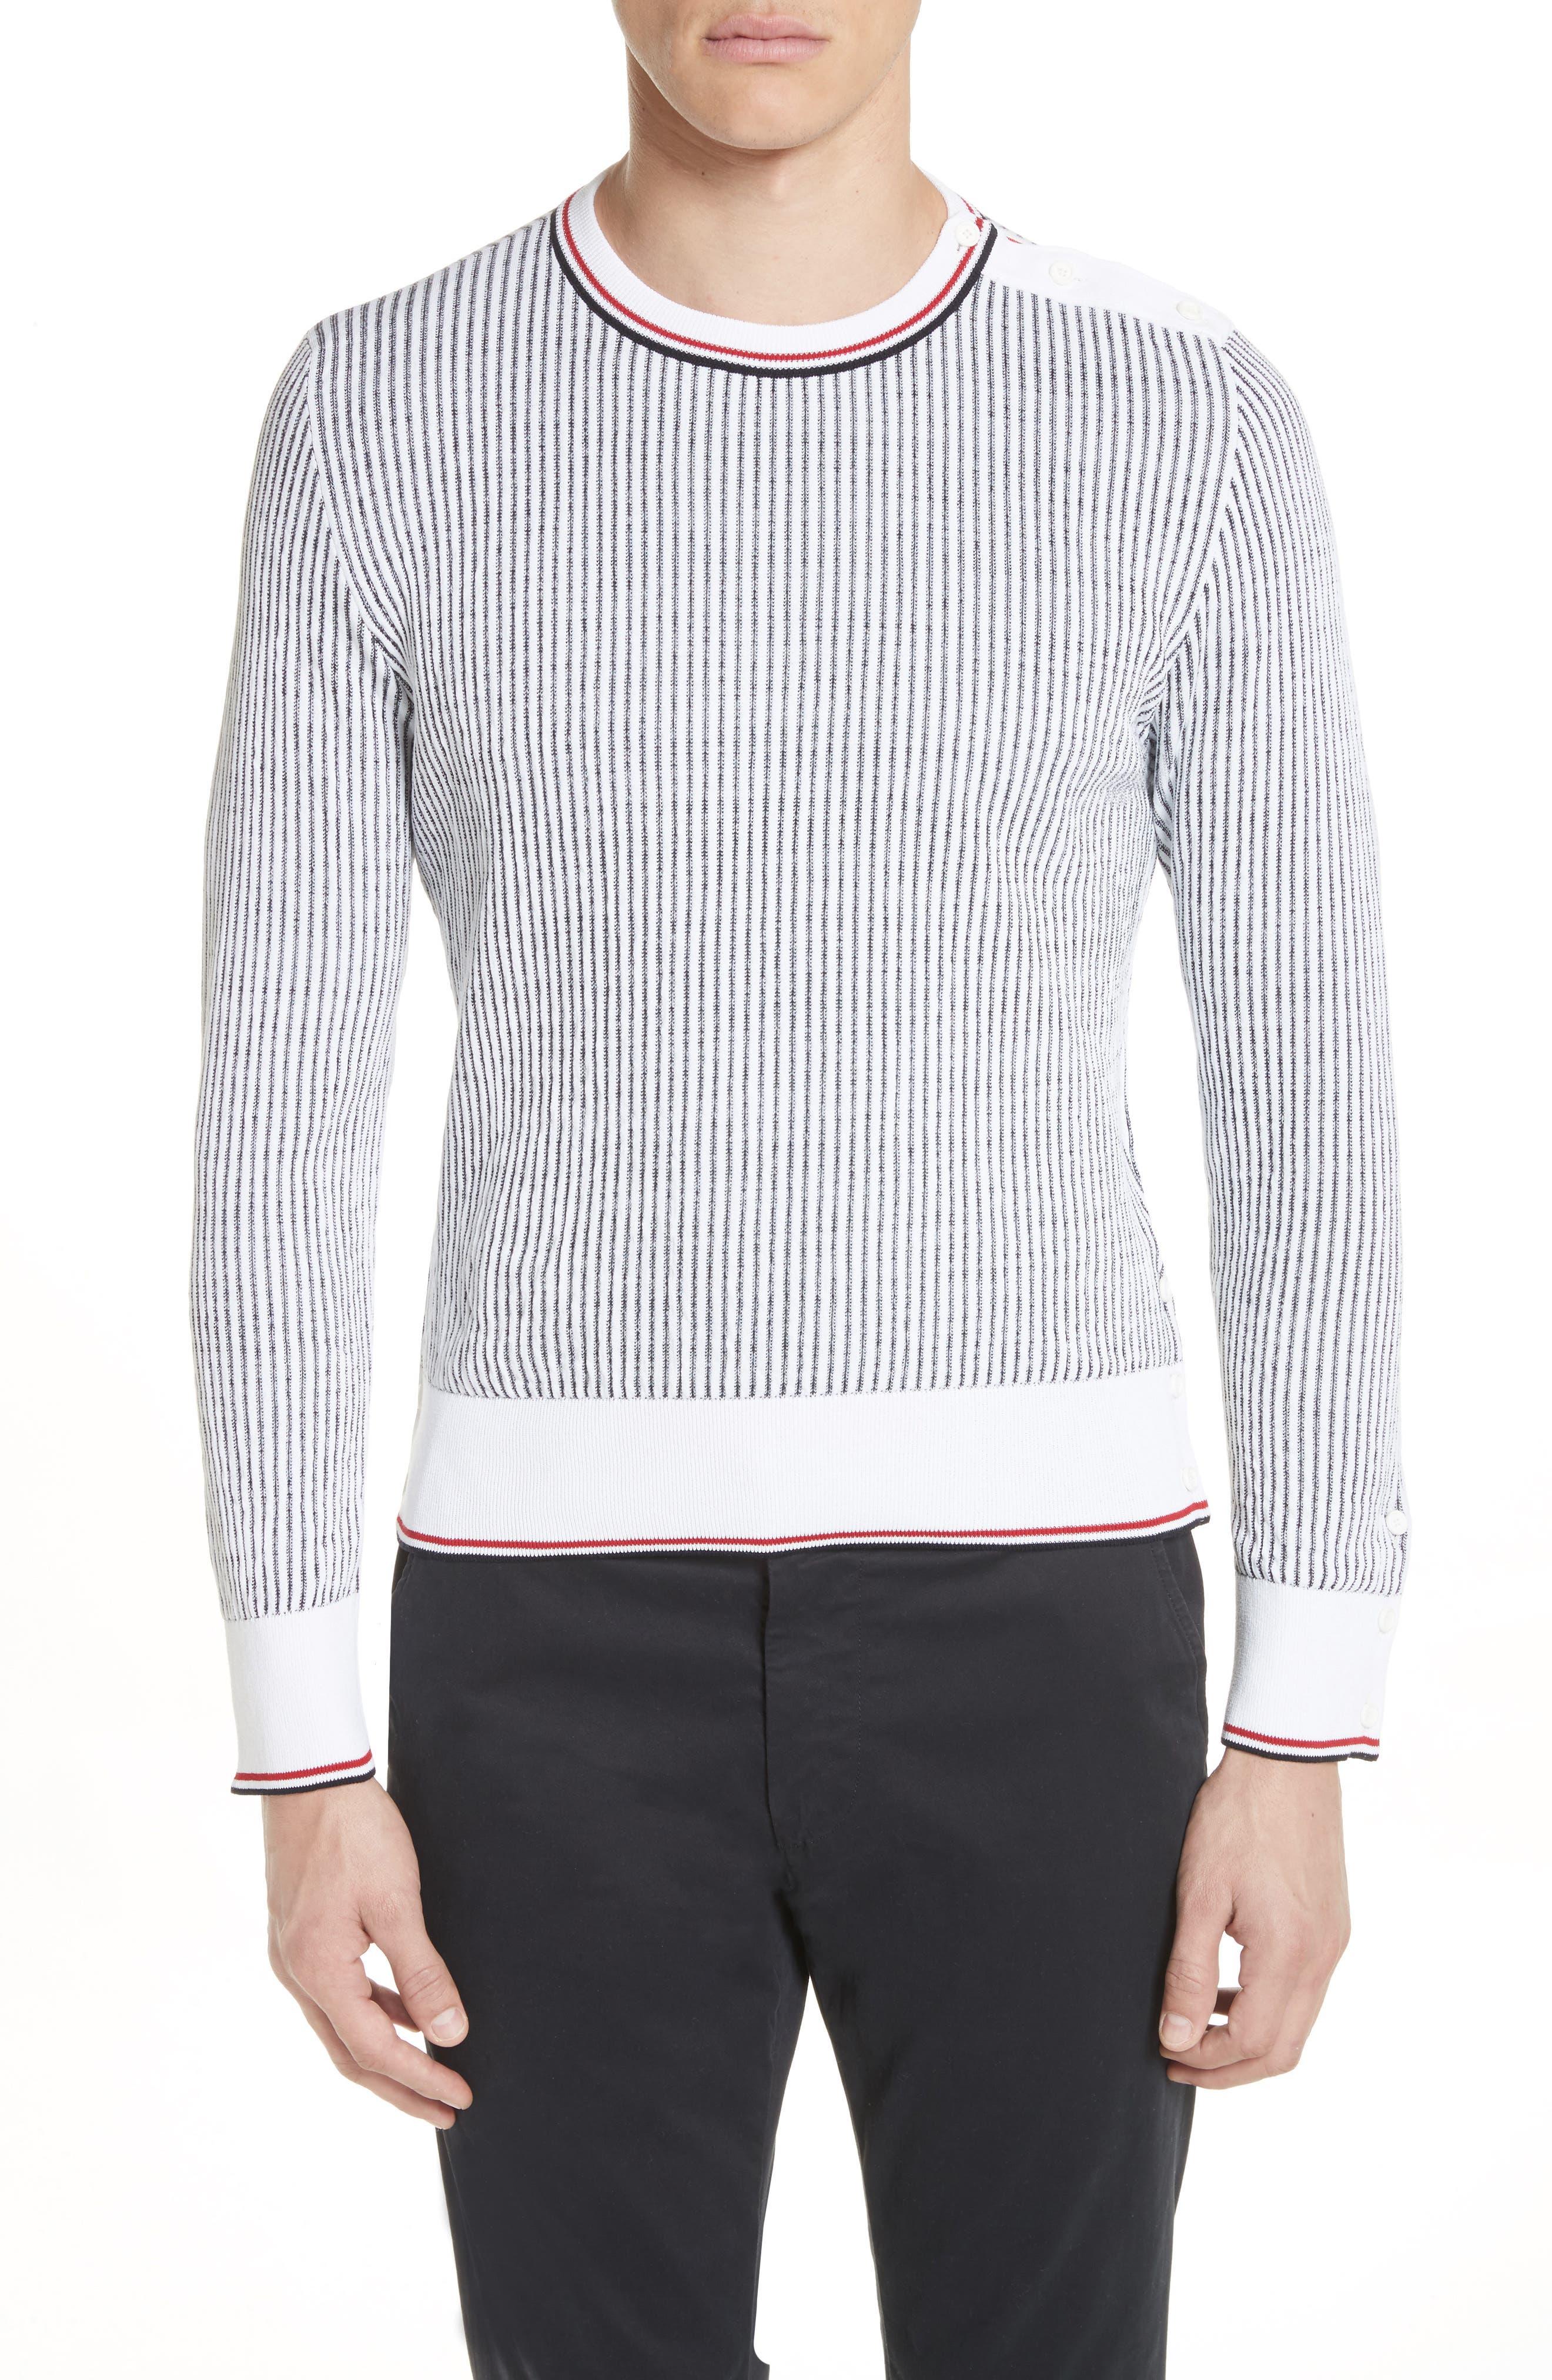 Thom Browne Stripe Crewneck Sweater